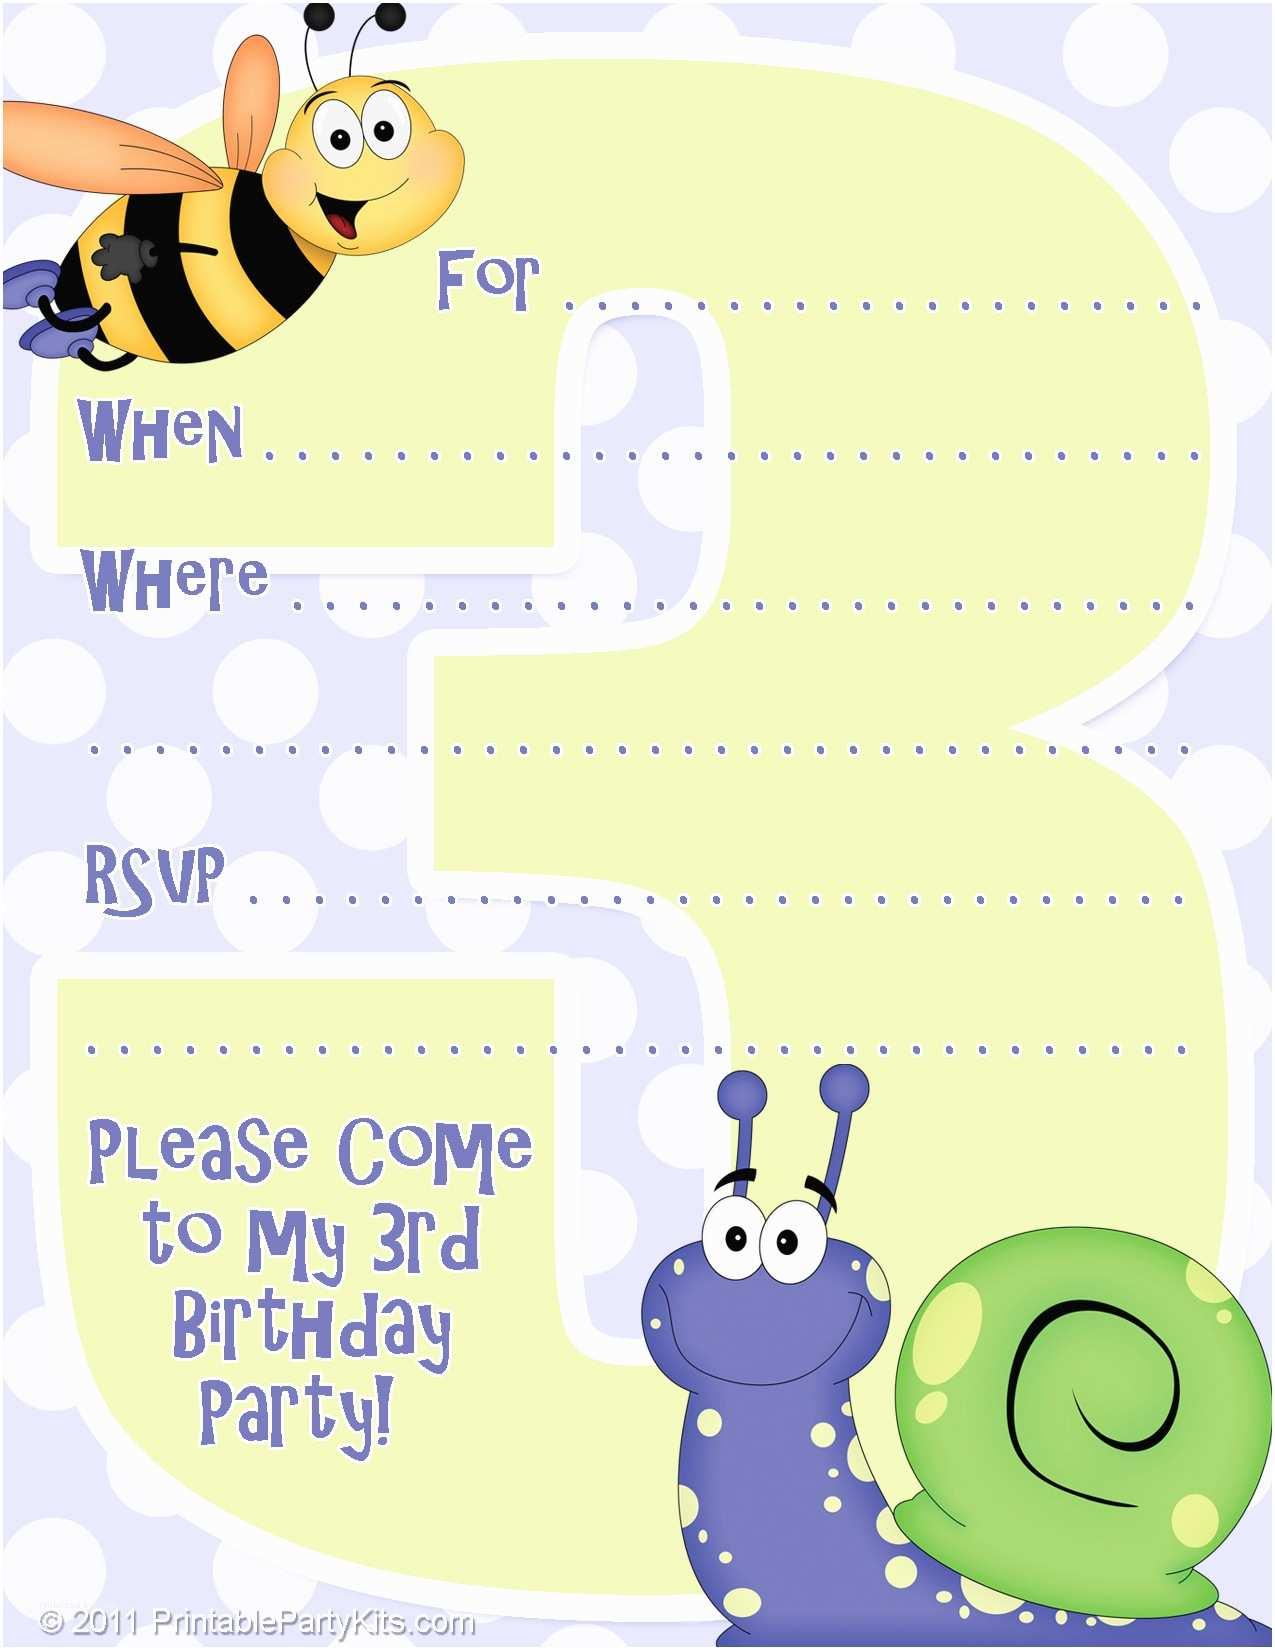 Birthday Party Invitations Free Free Printable Birthday Party Invitations